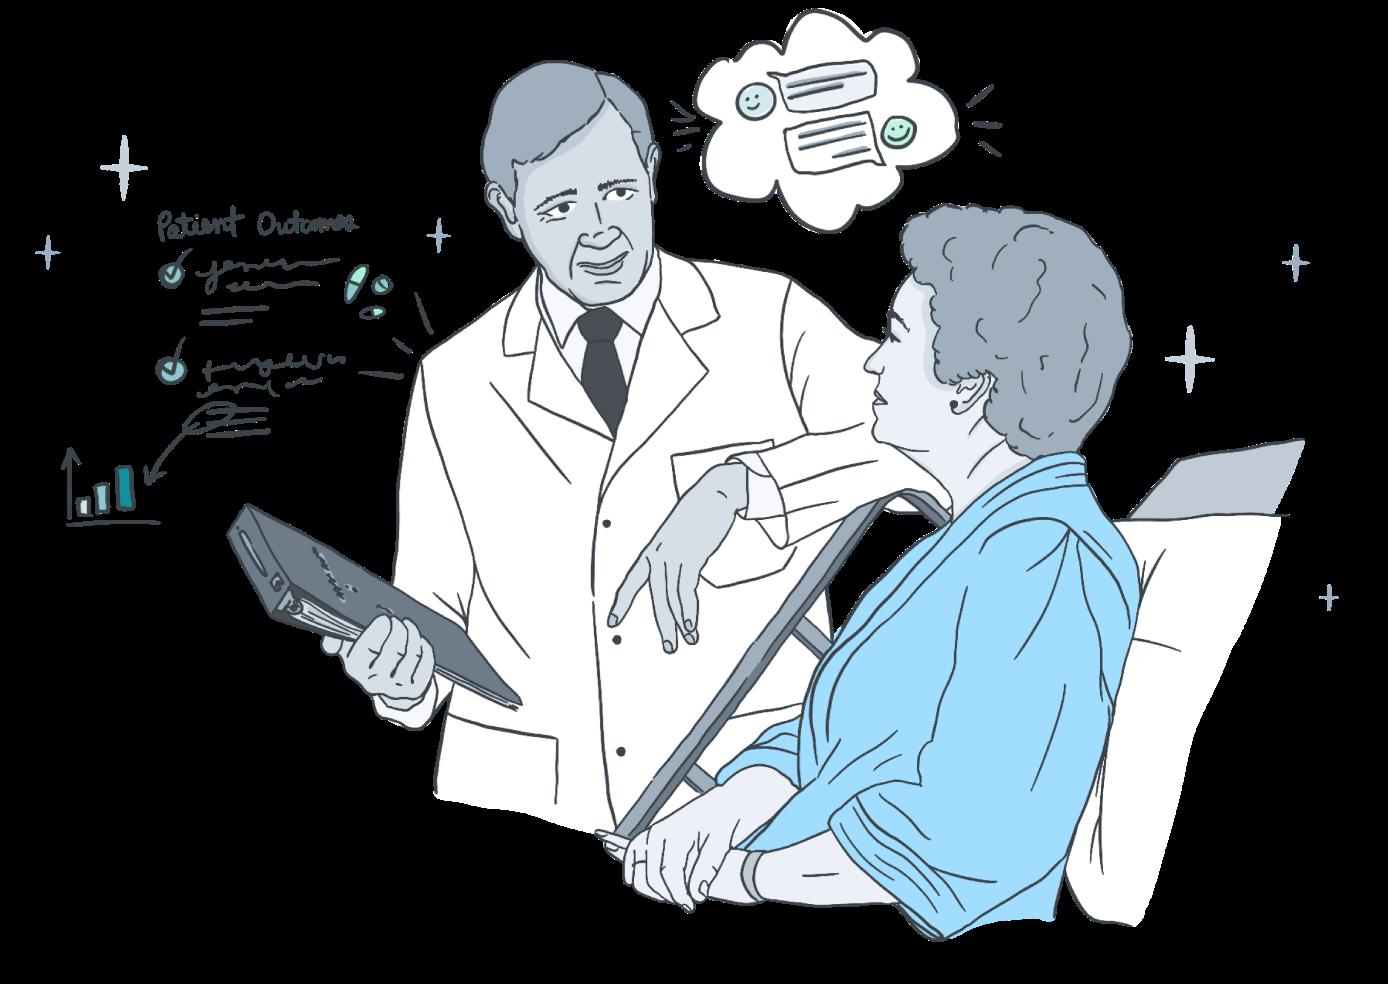 Conversation with Patient